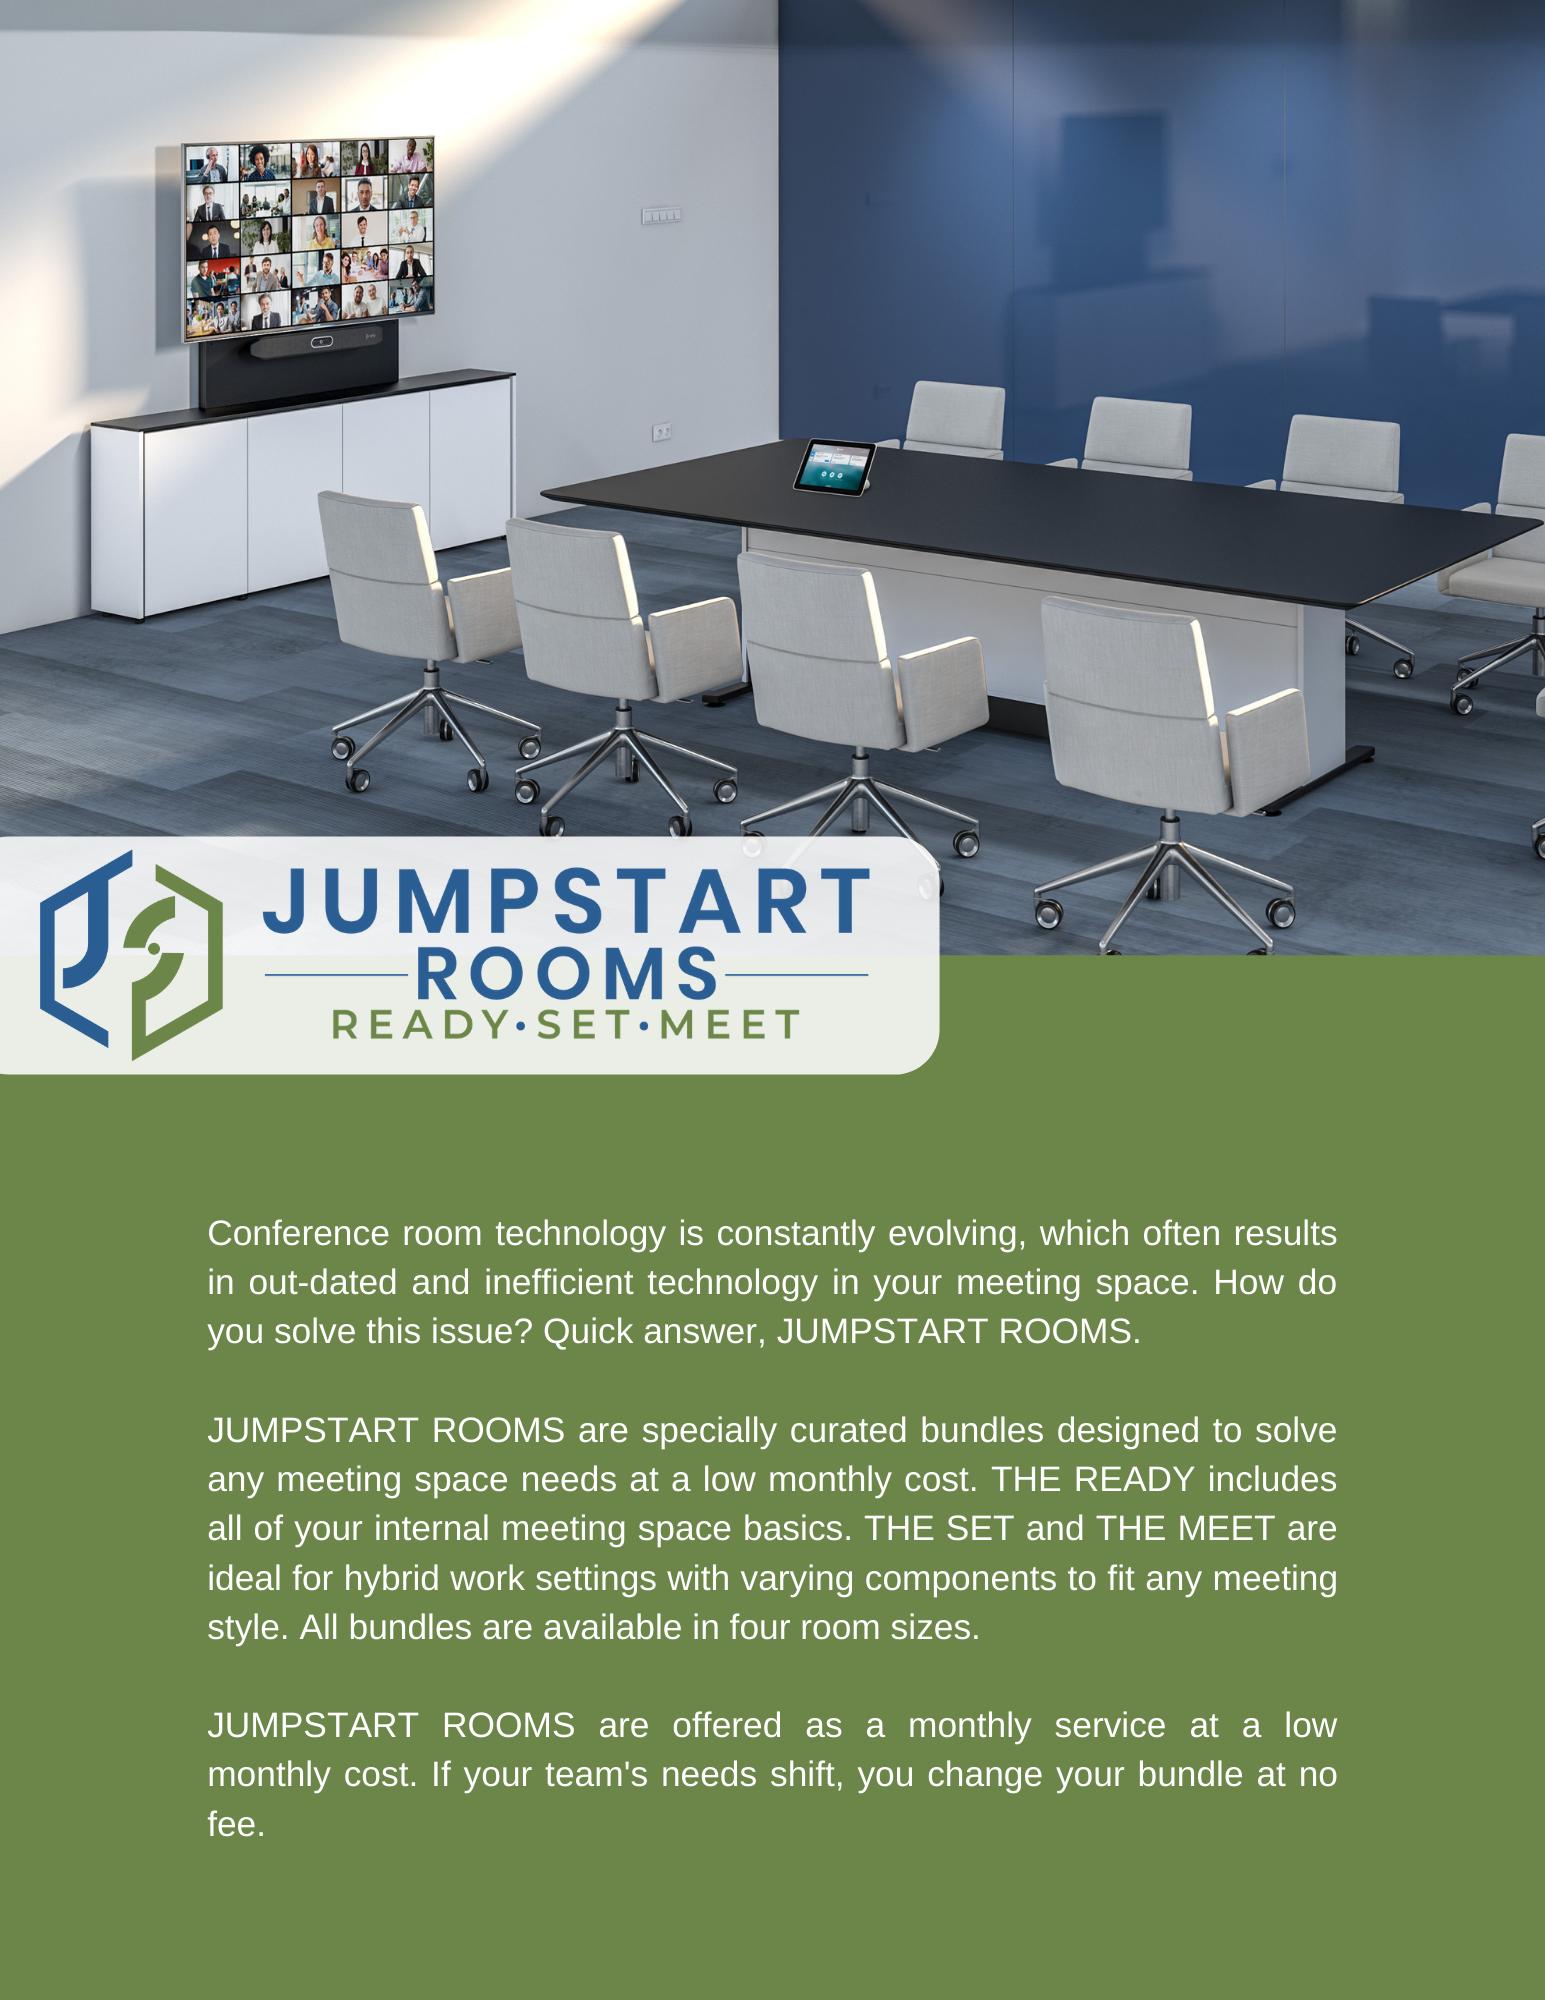 JUMPSTART ROOMS Product Sheet -Image